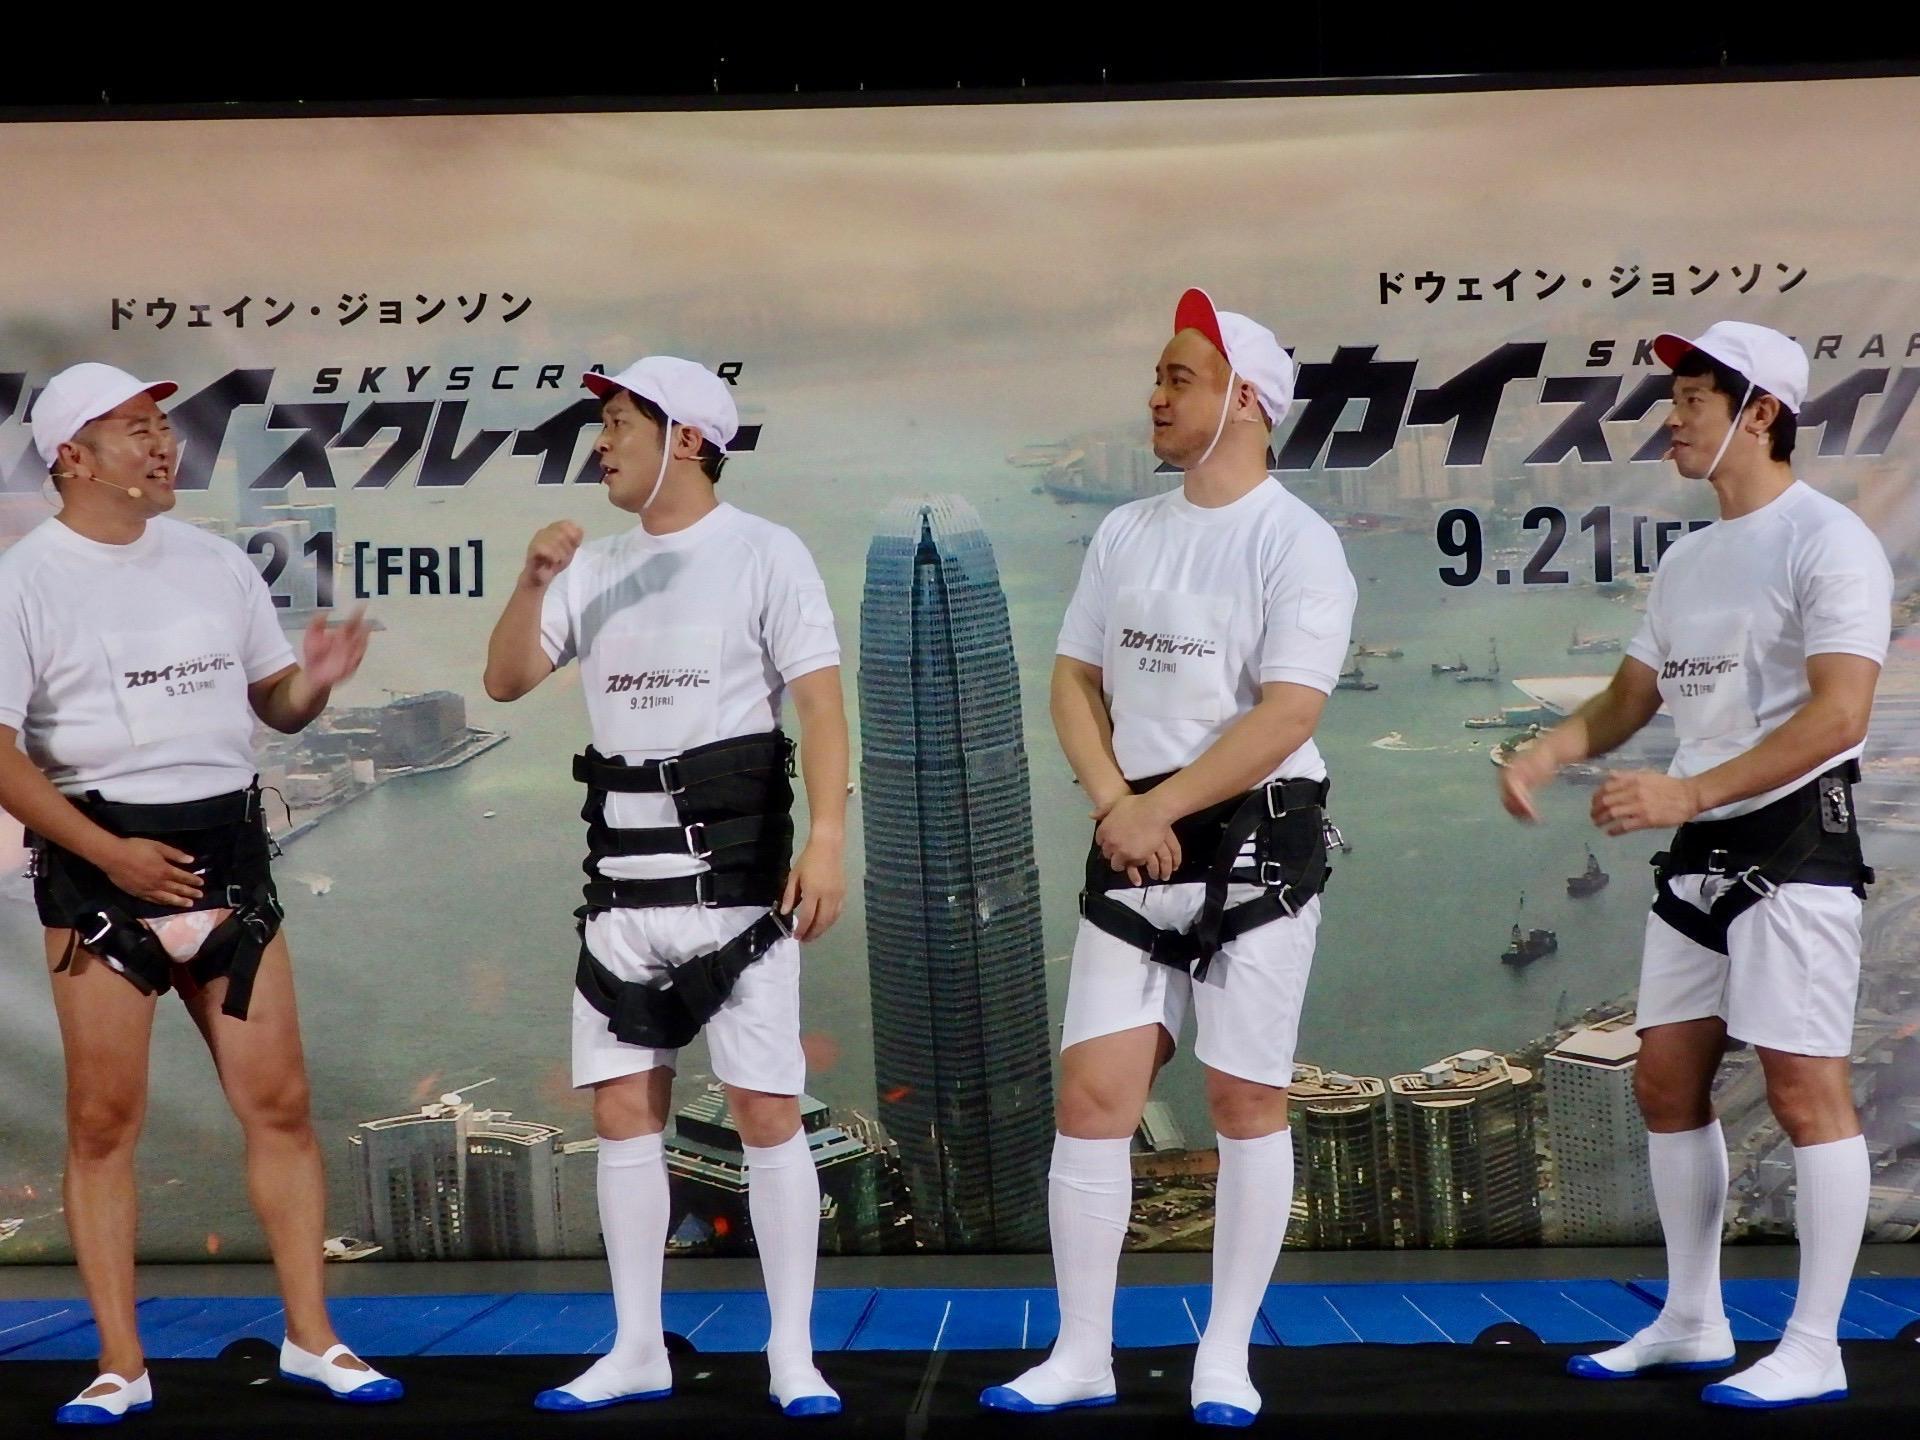 http://news.yoshimoto.co.jp/20180911175536-38daa224fef1eac4d24a7b47c9bedac187fe8131.jpg